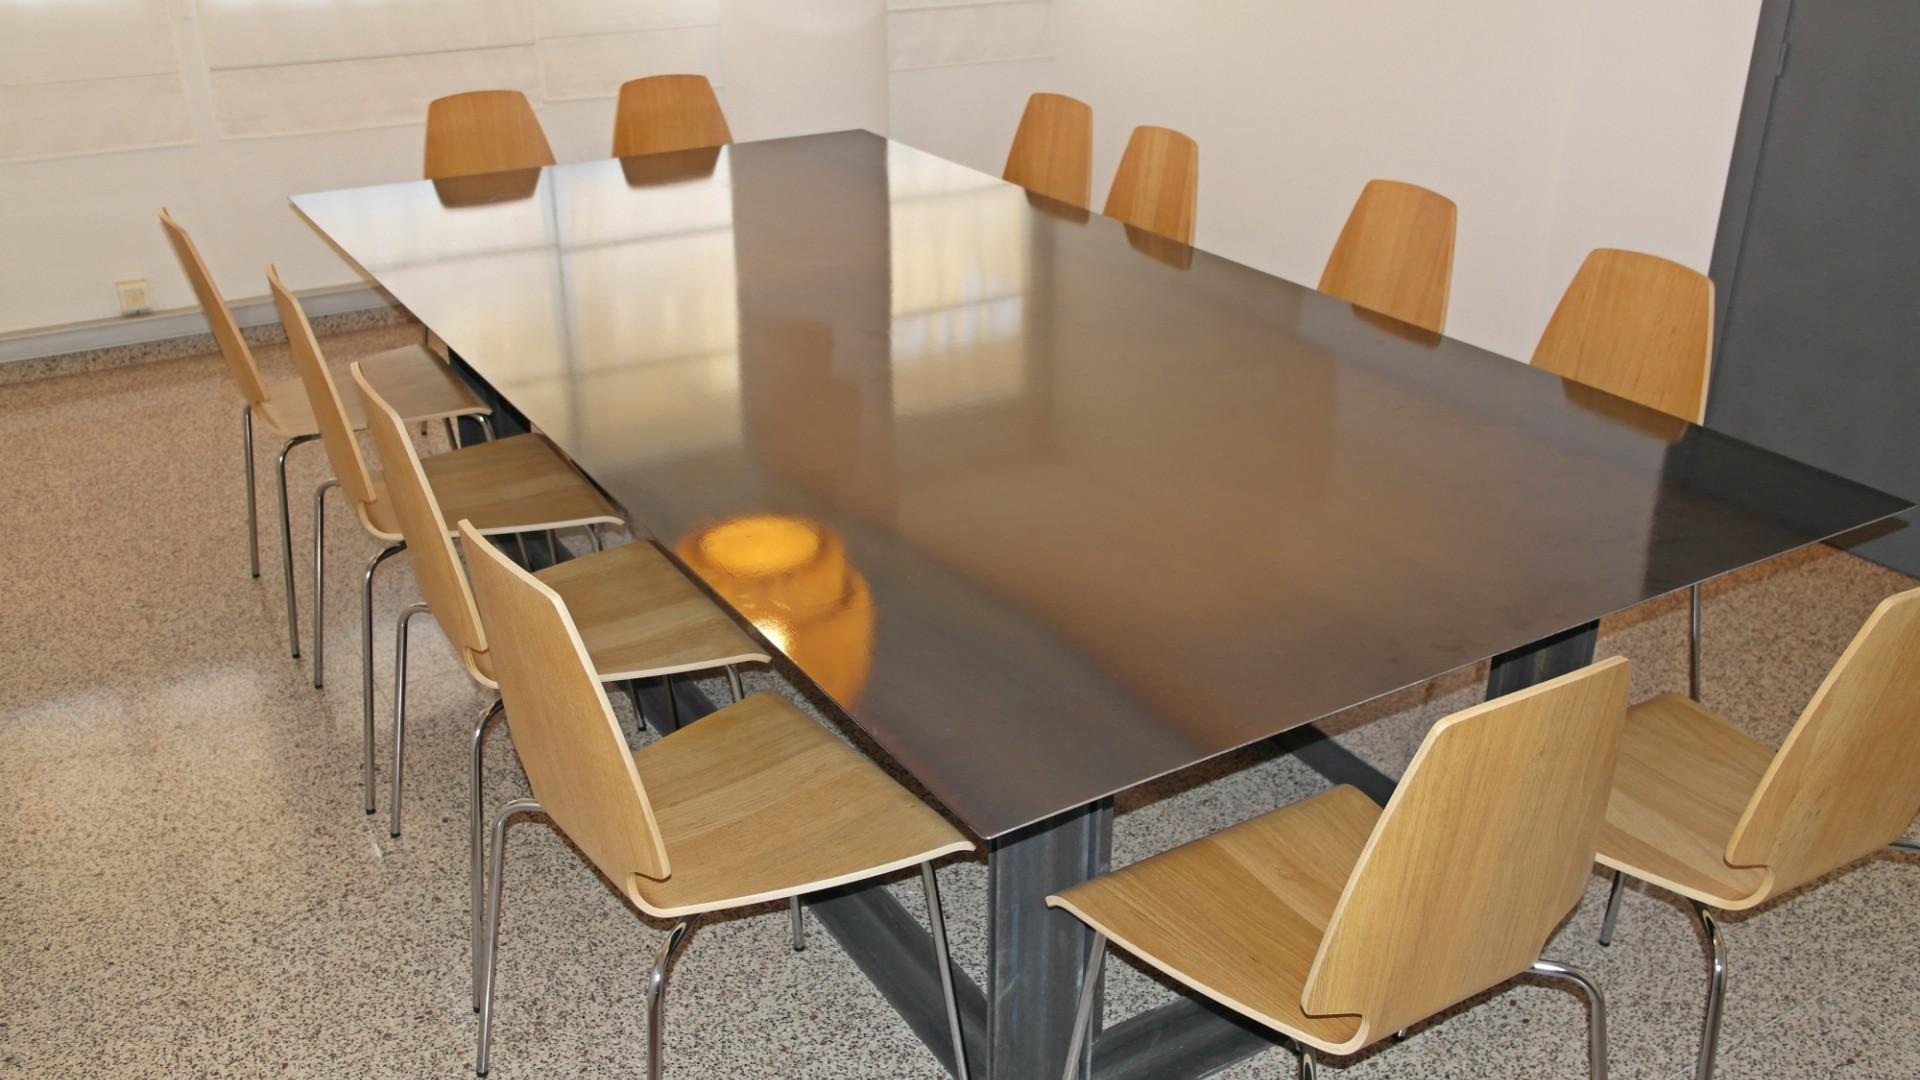 mv33 coworking - sala de reuniones